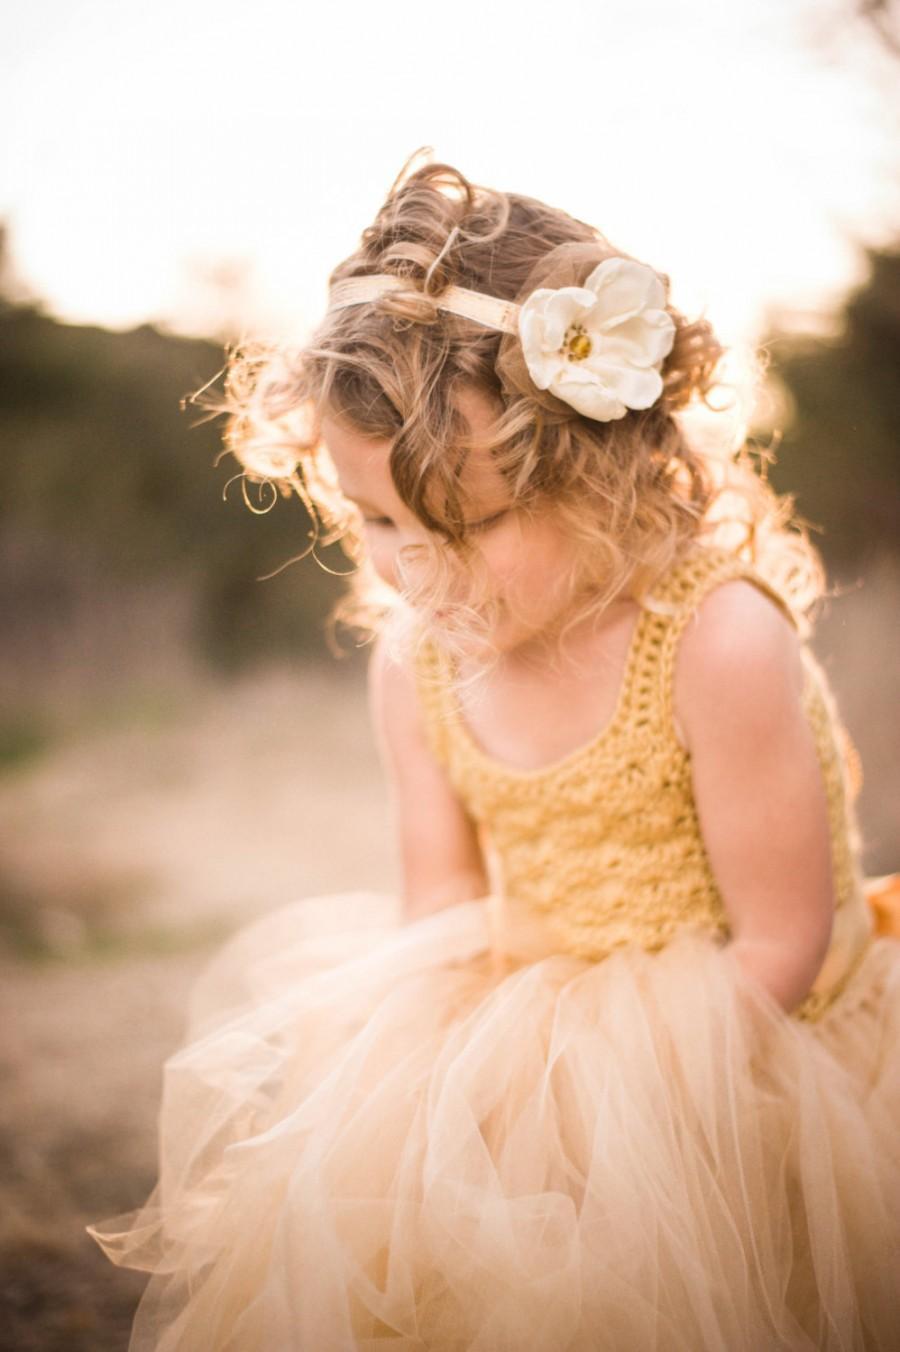 http://s3.weddbook.com/t4/2/4/7/2478979/gold-boho-flower-girl-dress-crochet-flower-girl-tutu-dress-toddler-tutu-dress-baby-tutu-dress-birthday-and-photo-prop-tutu.jpg